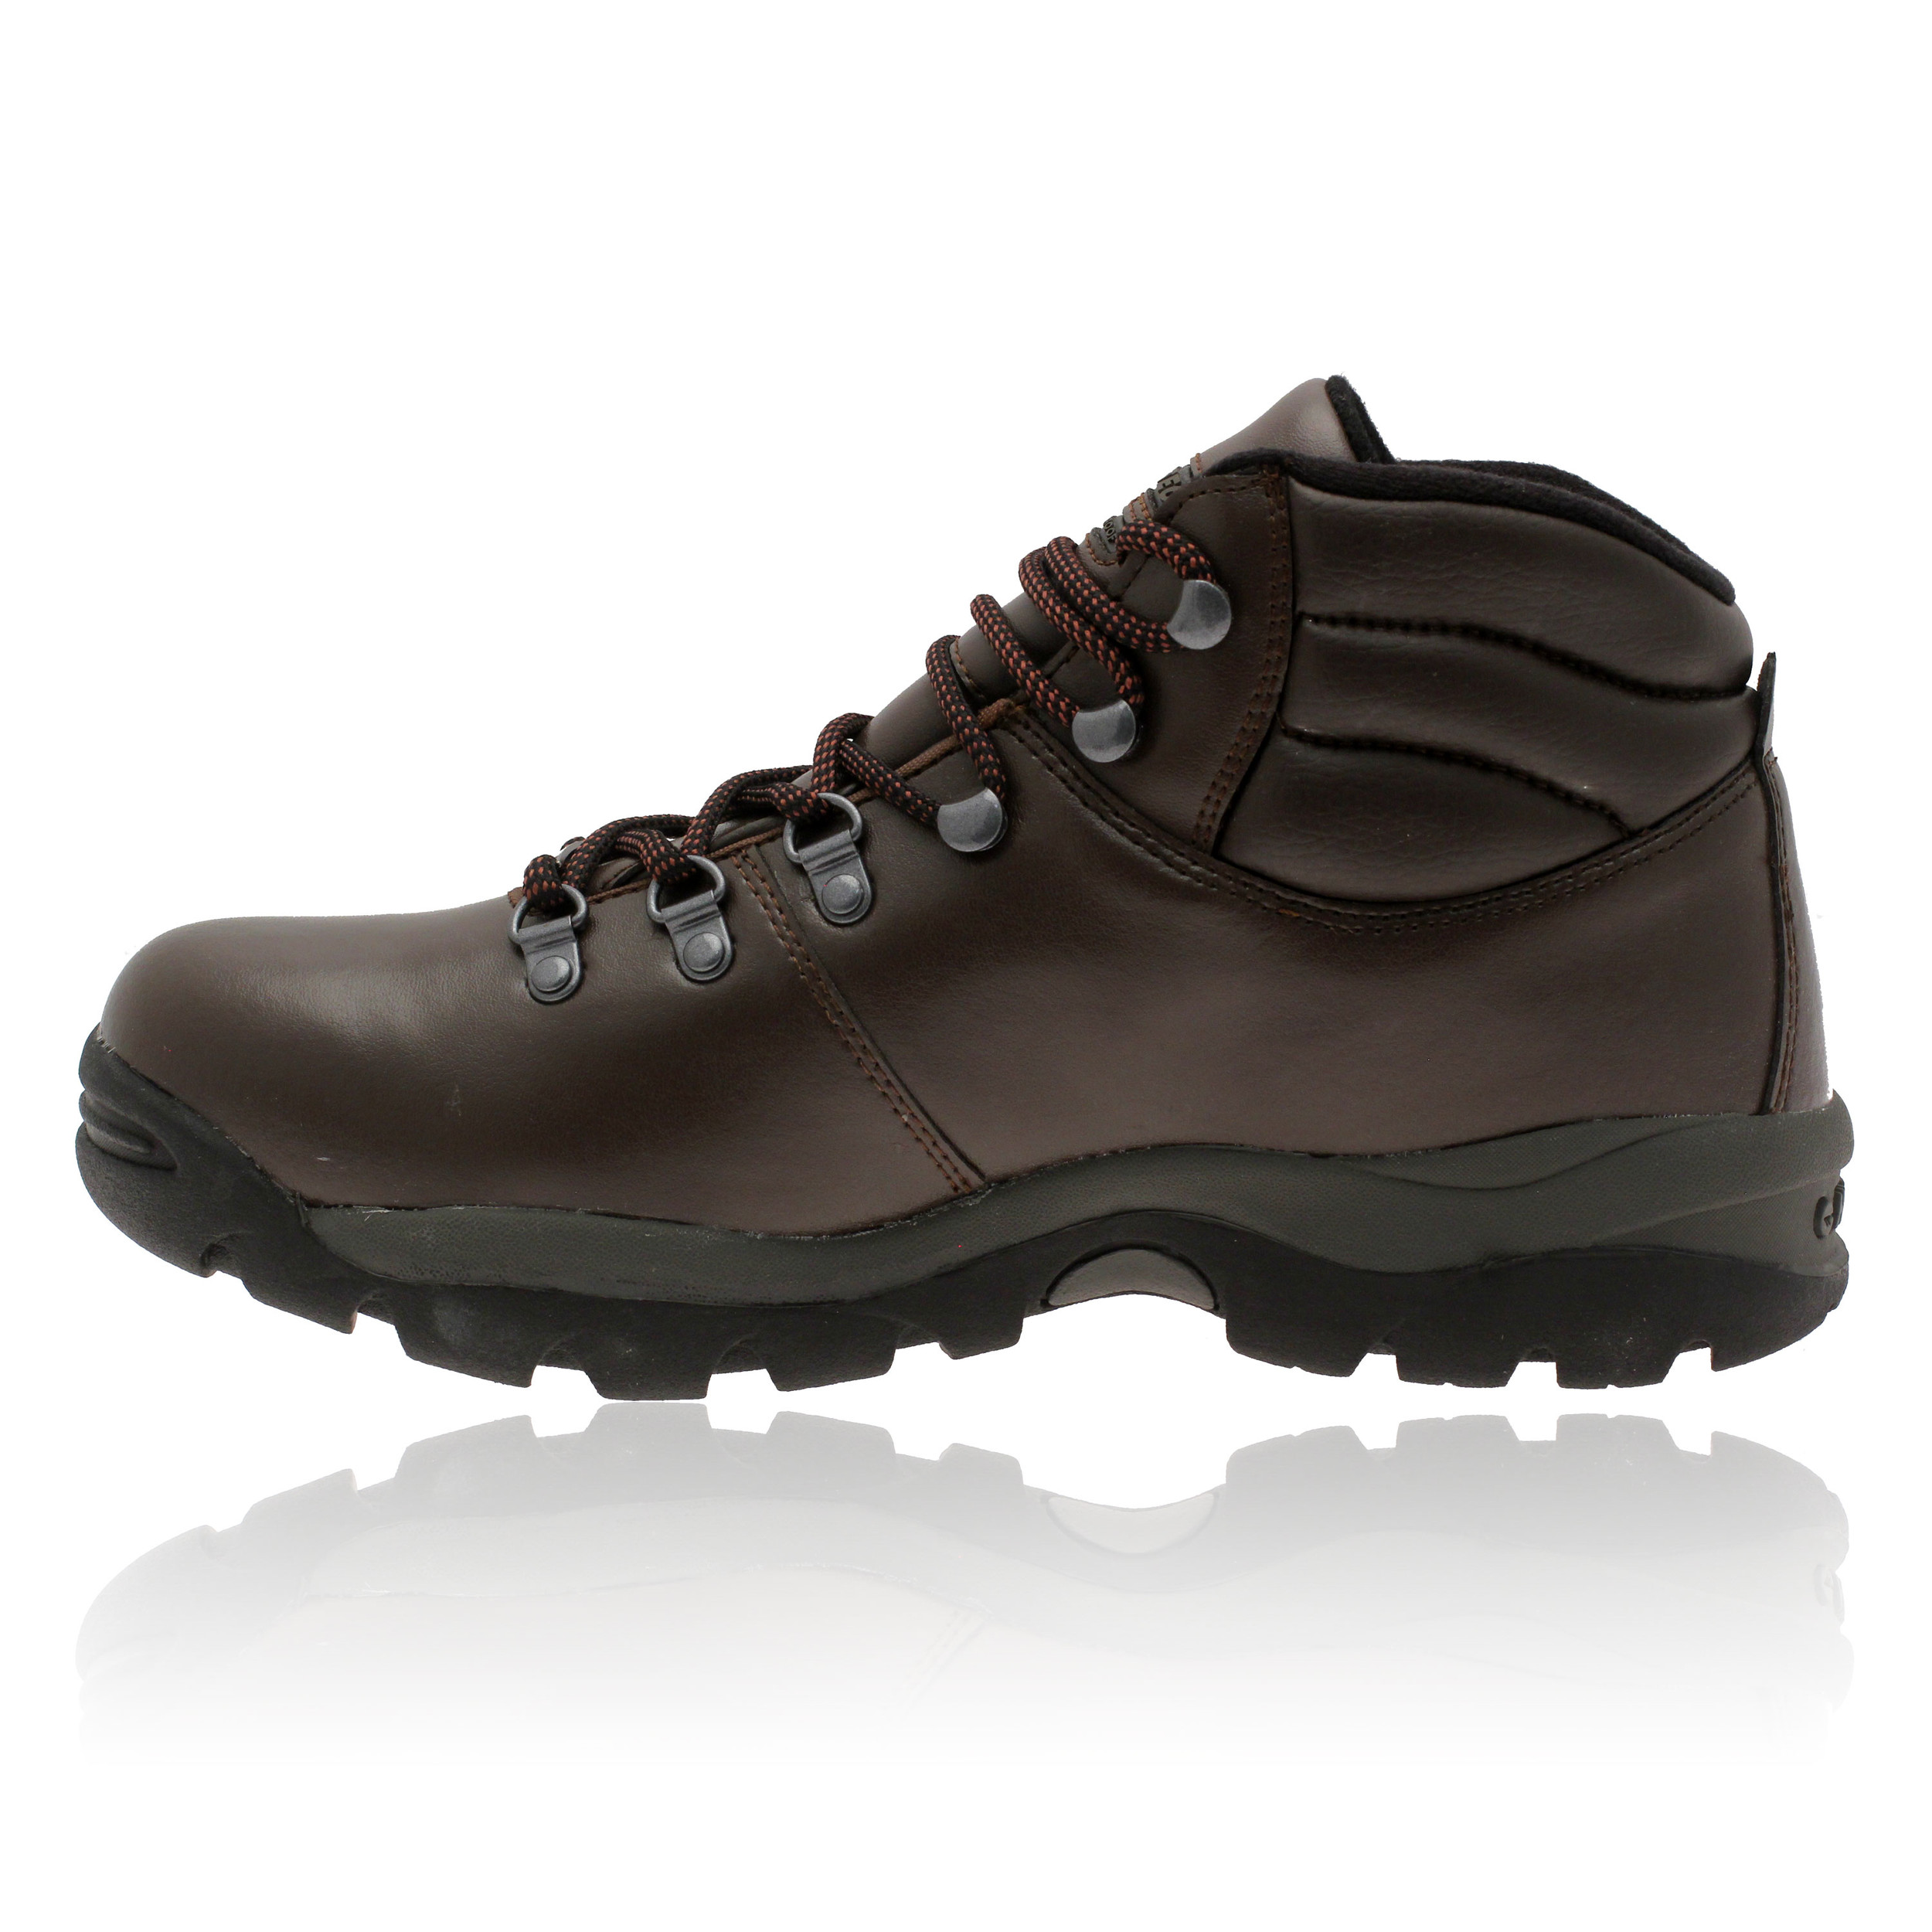 hi tec mens eurotrek brown waterproof grain leather